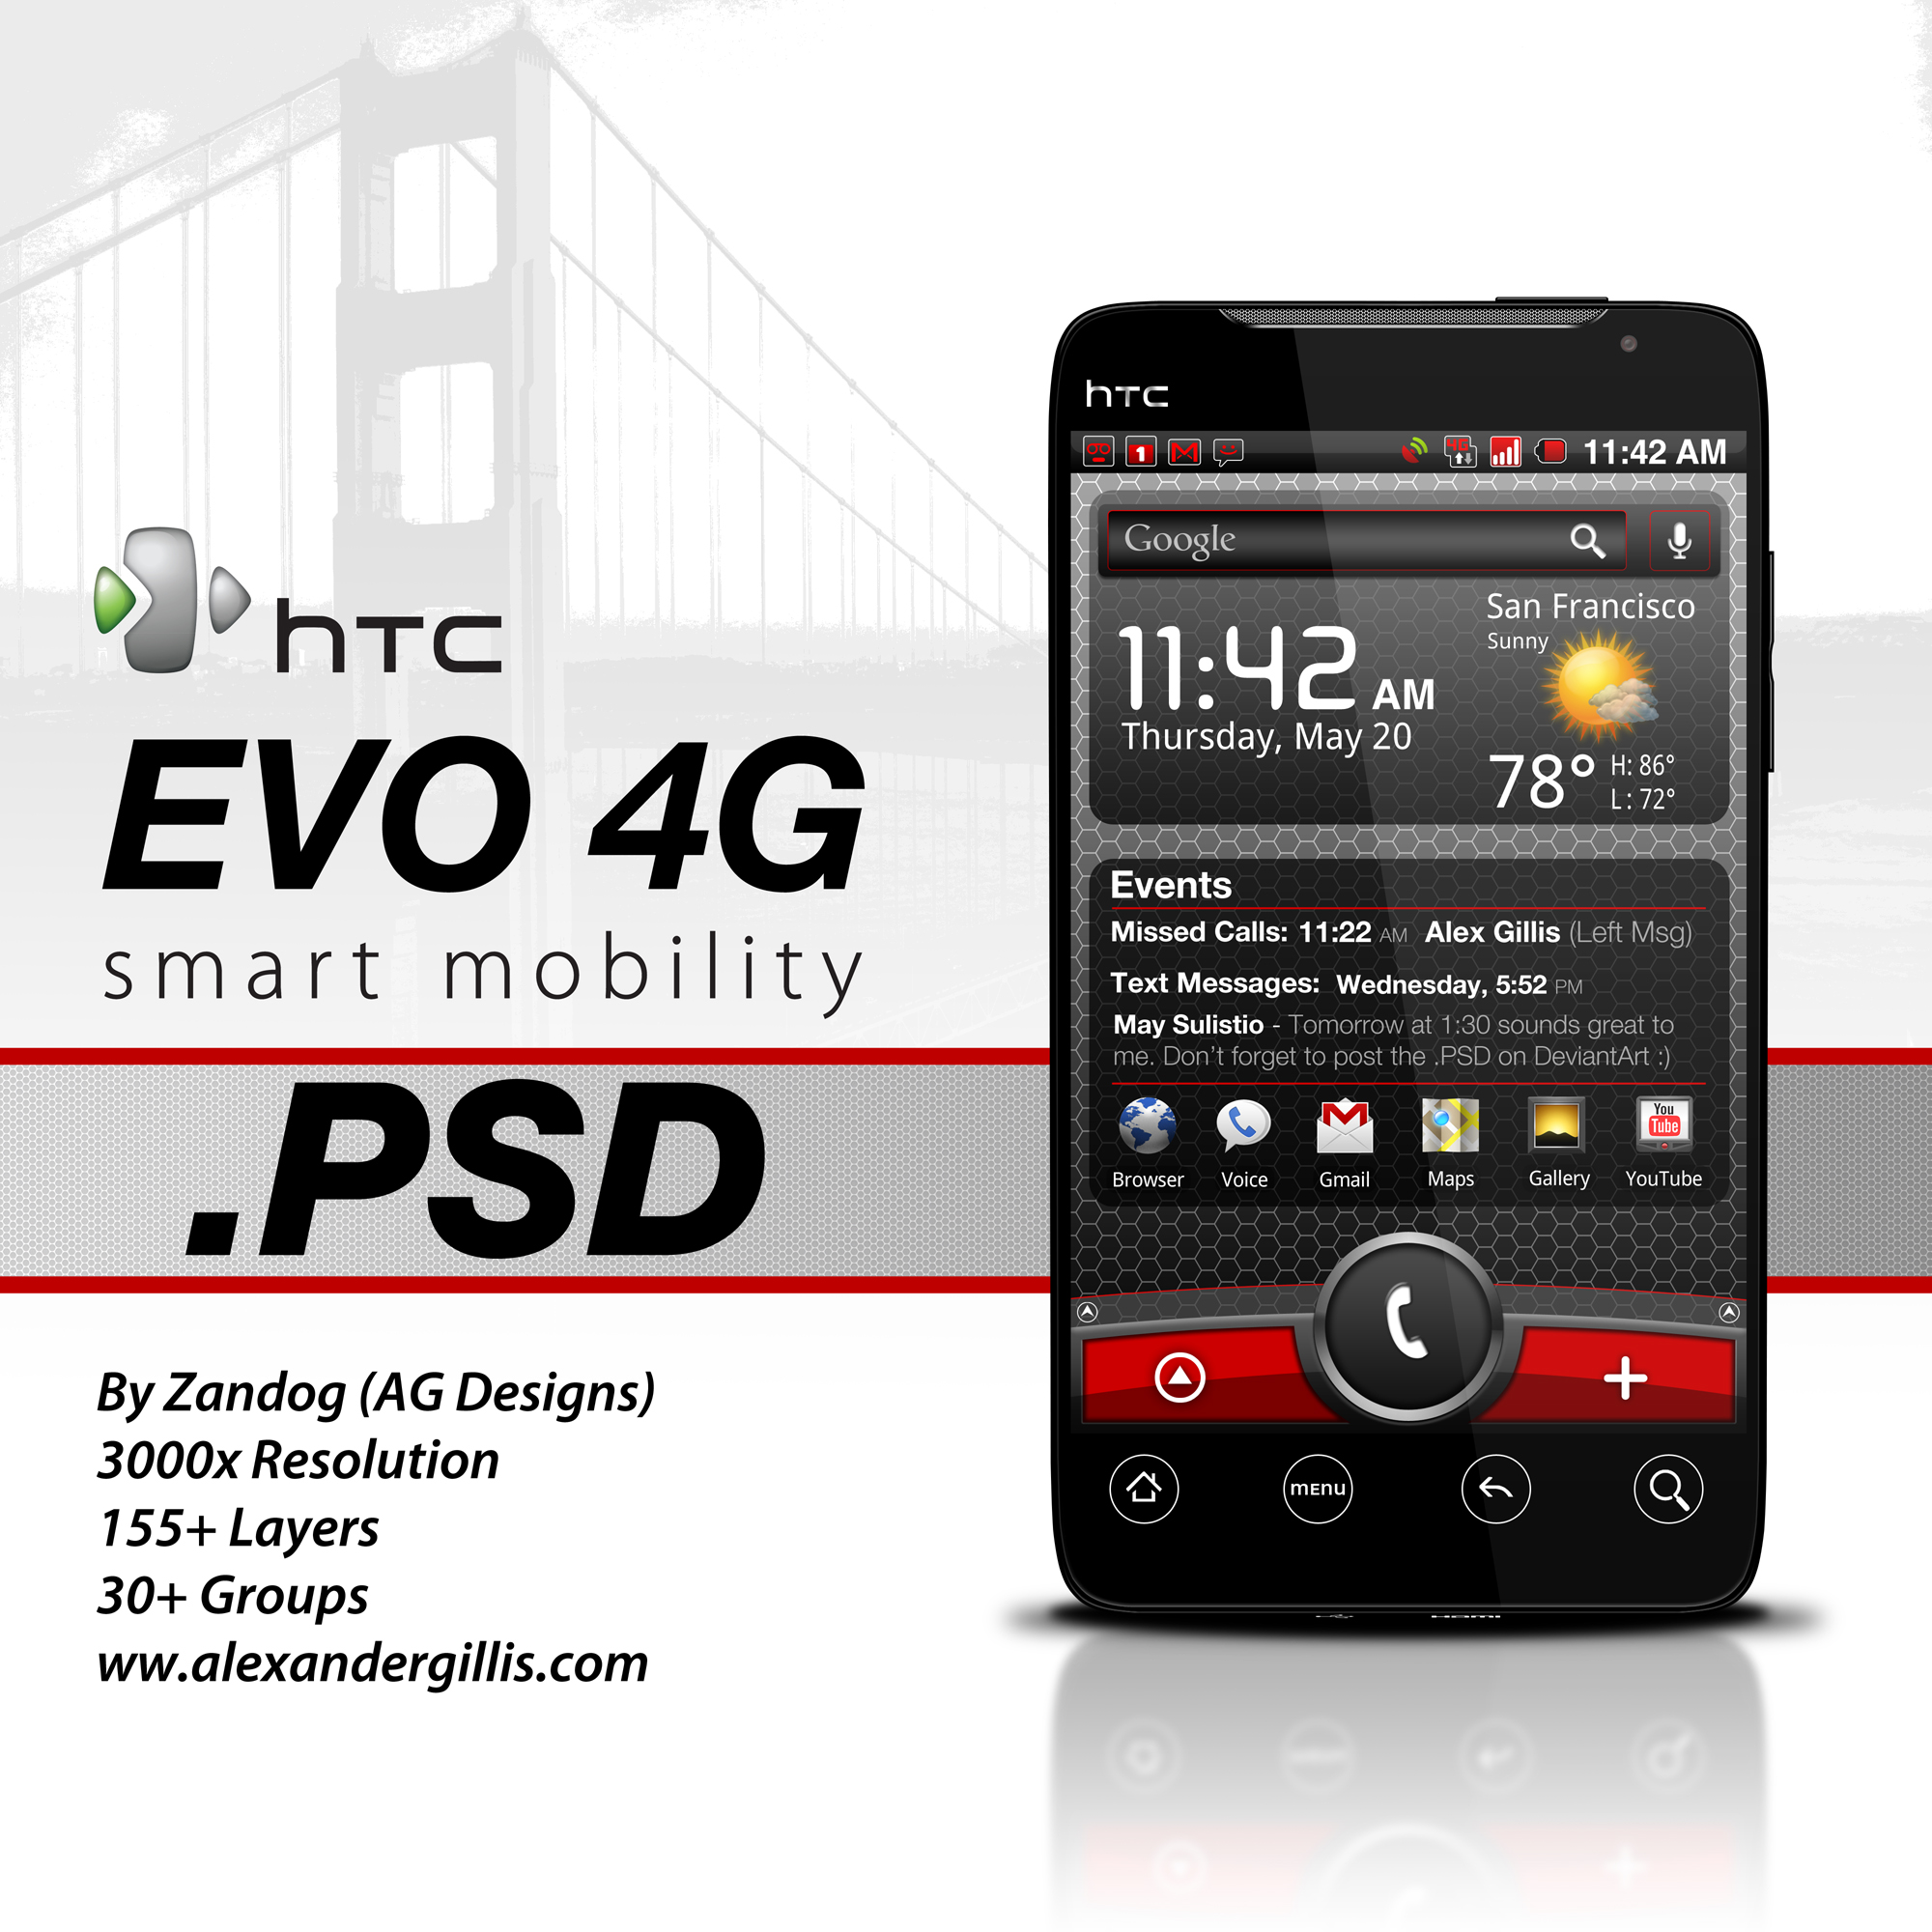 HTC EVO 4G .PSD by zandog